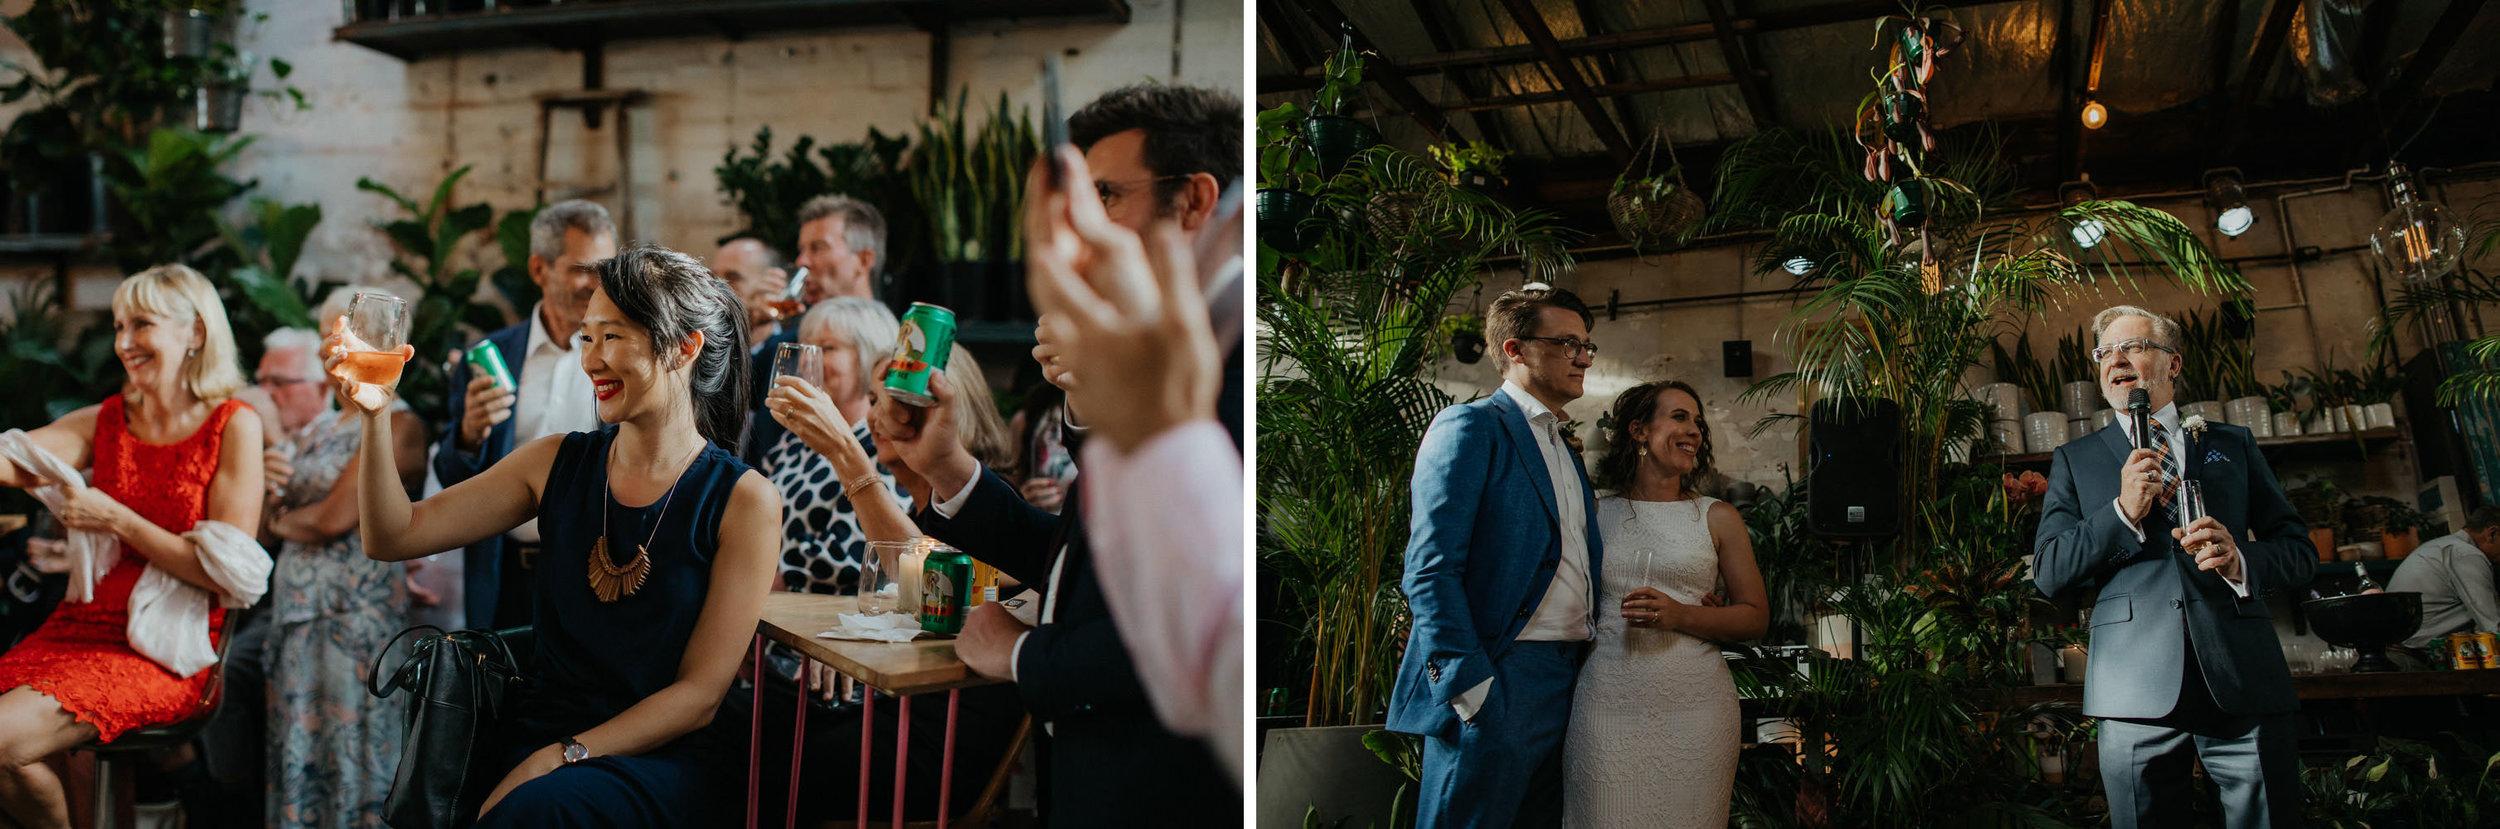 glasshaus_inside_melbourne_wedding_140(2985) copy.jpg